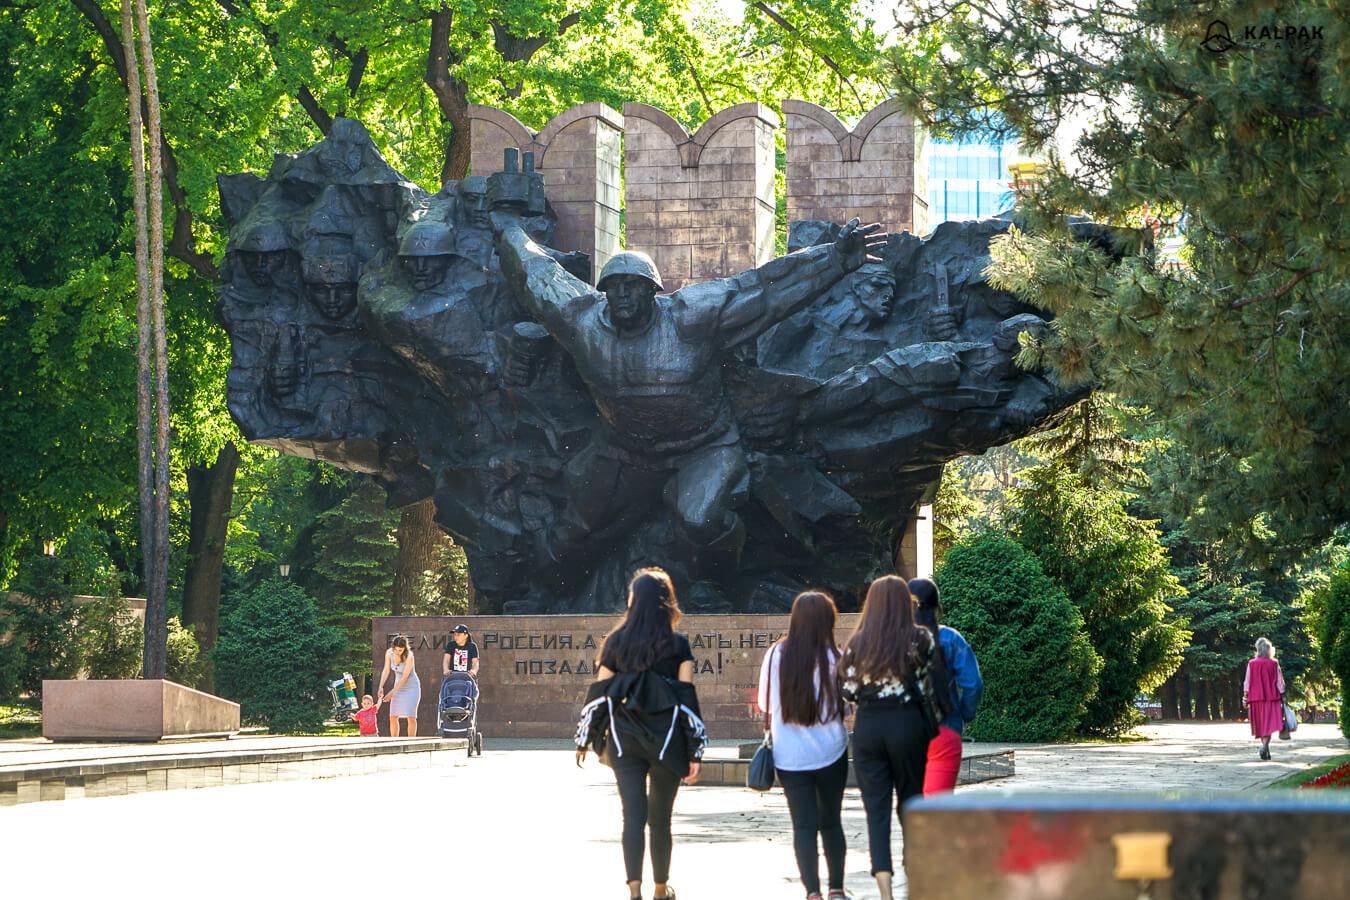 Almaty statue in Panfilov Park